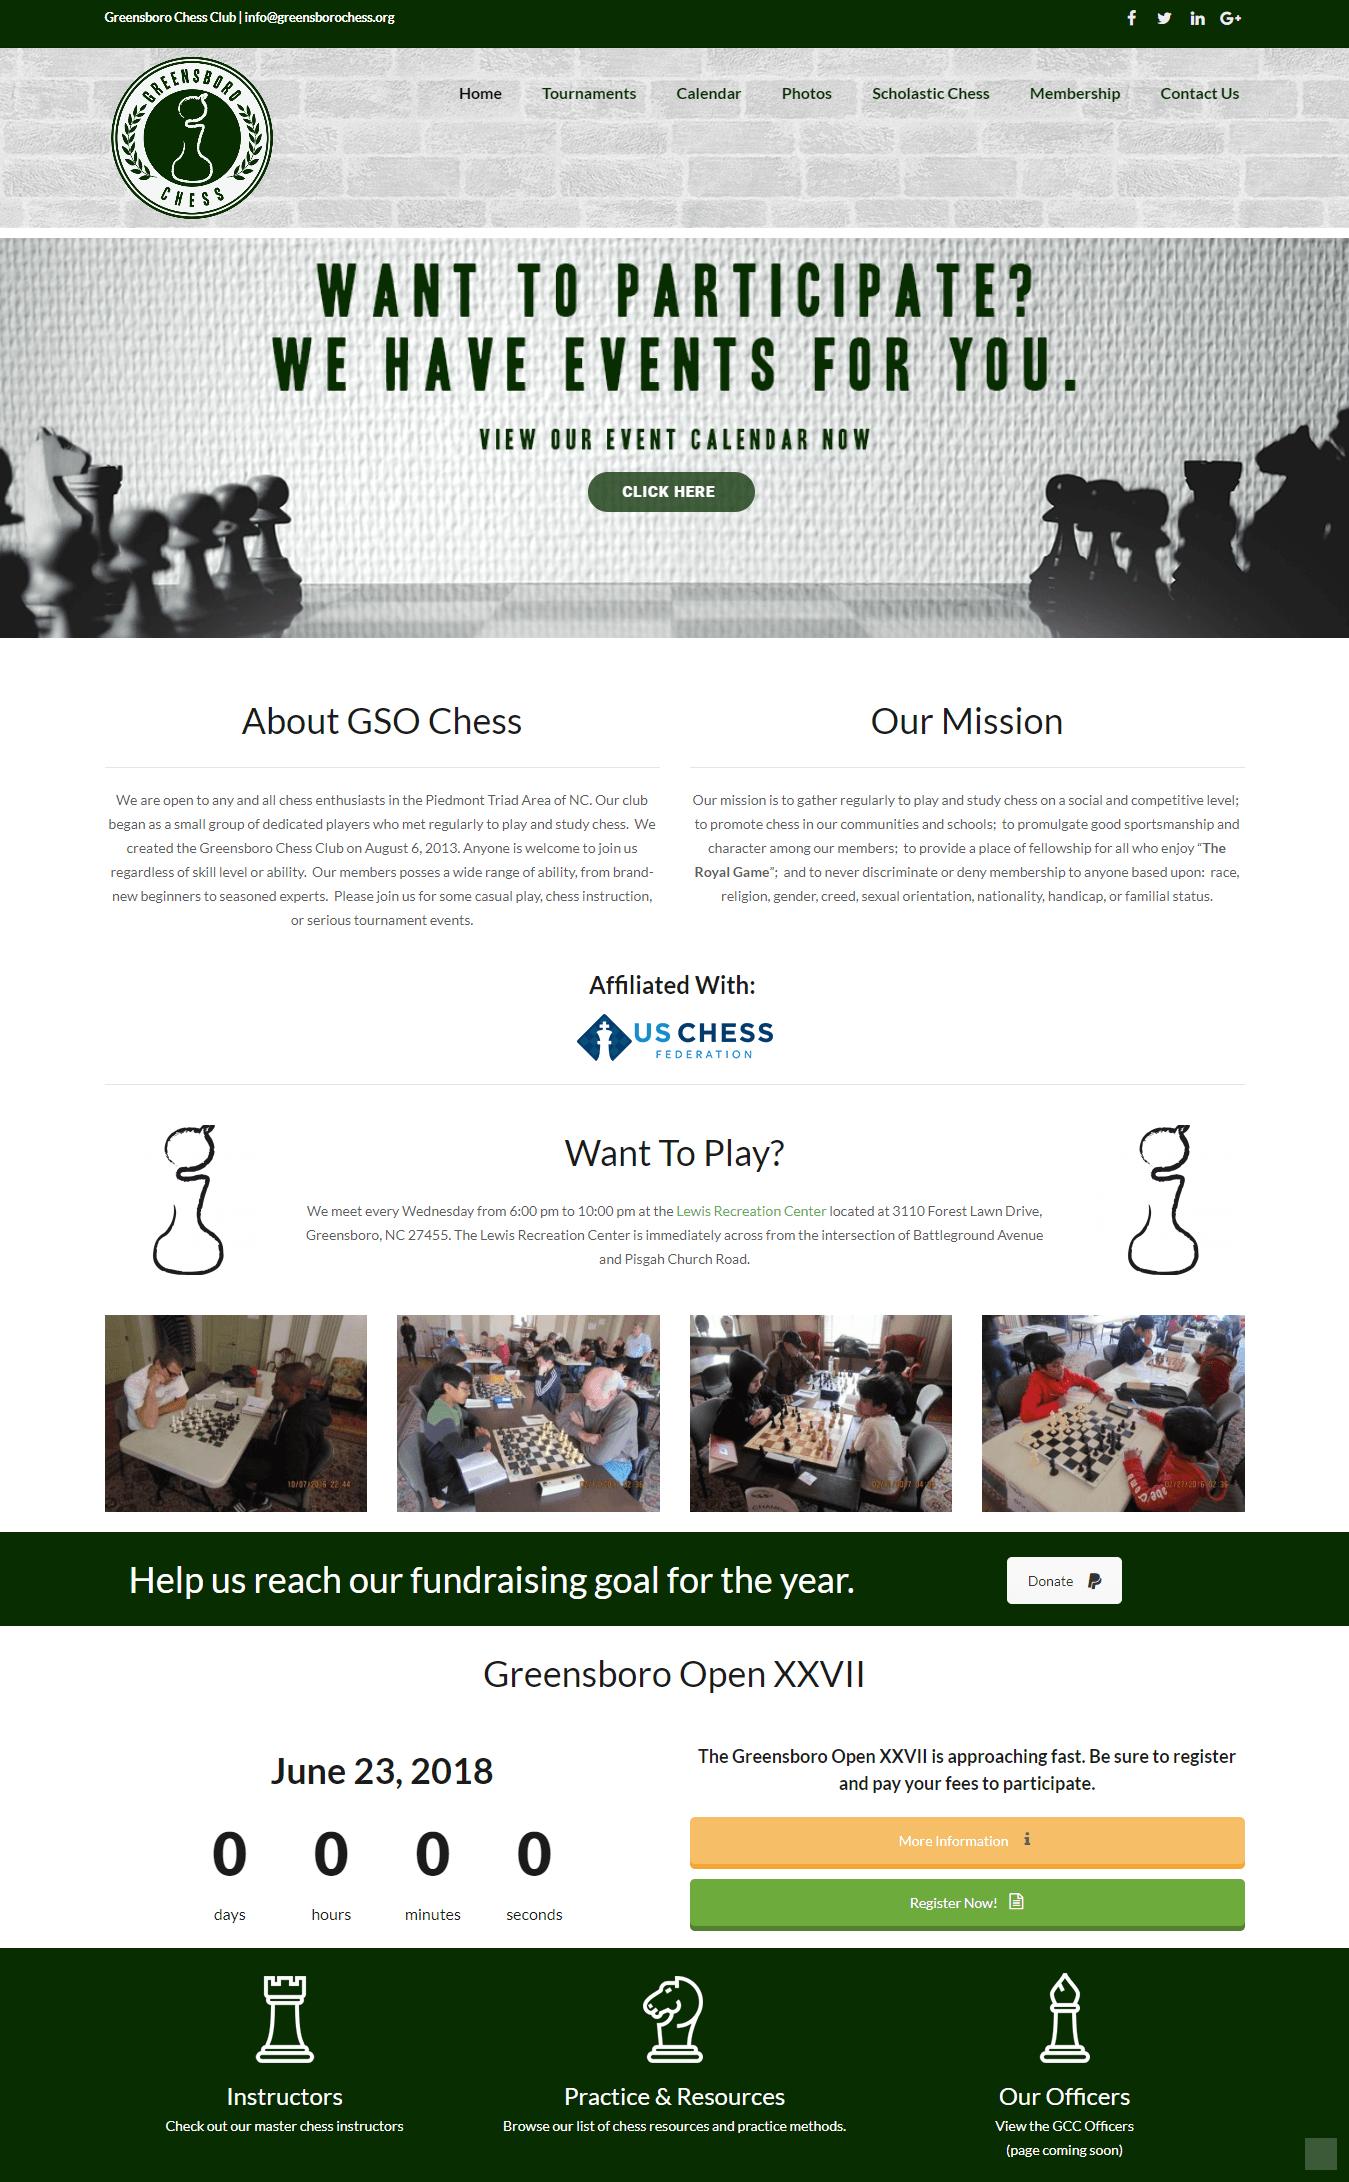 iMac with screenshot of Greensboro Chess Club website designed by Greensboro website design company Noctem Media.